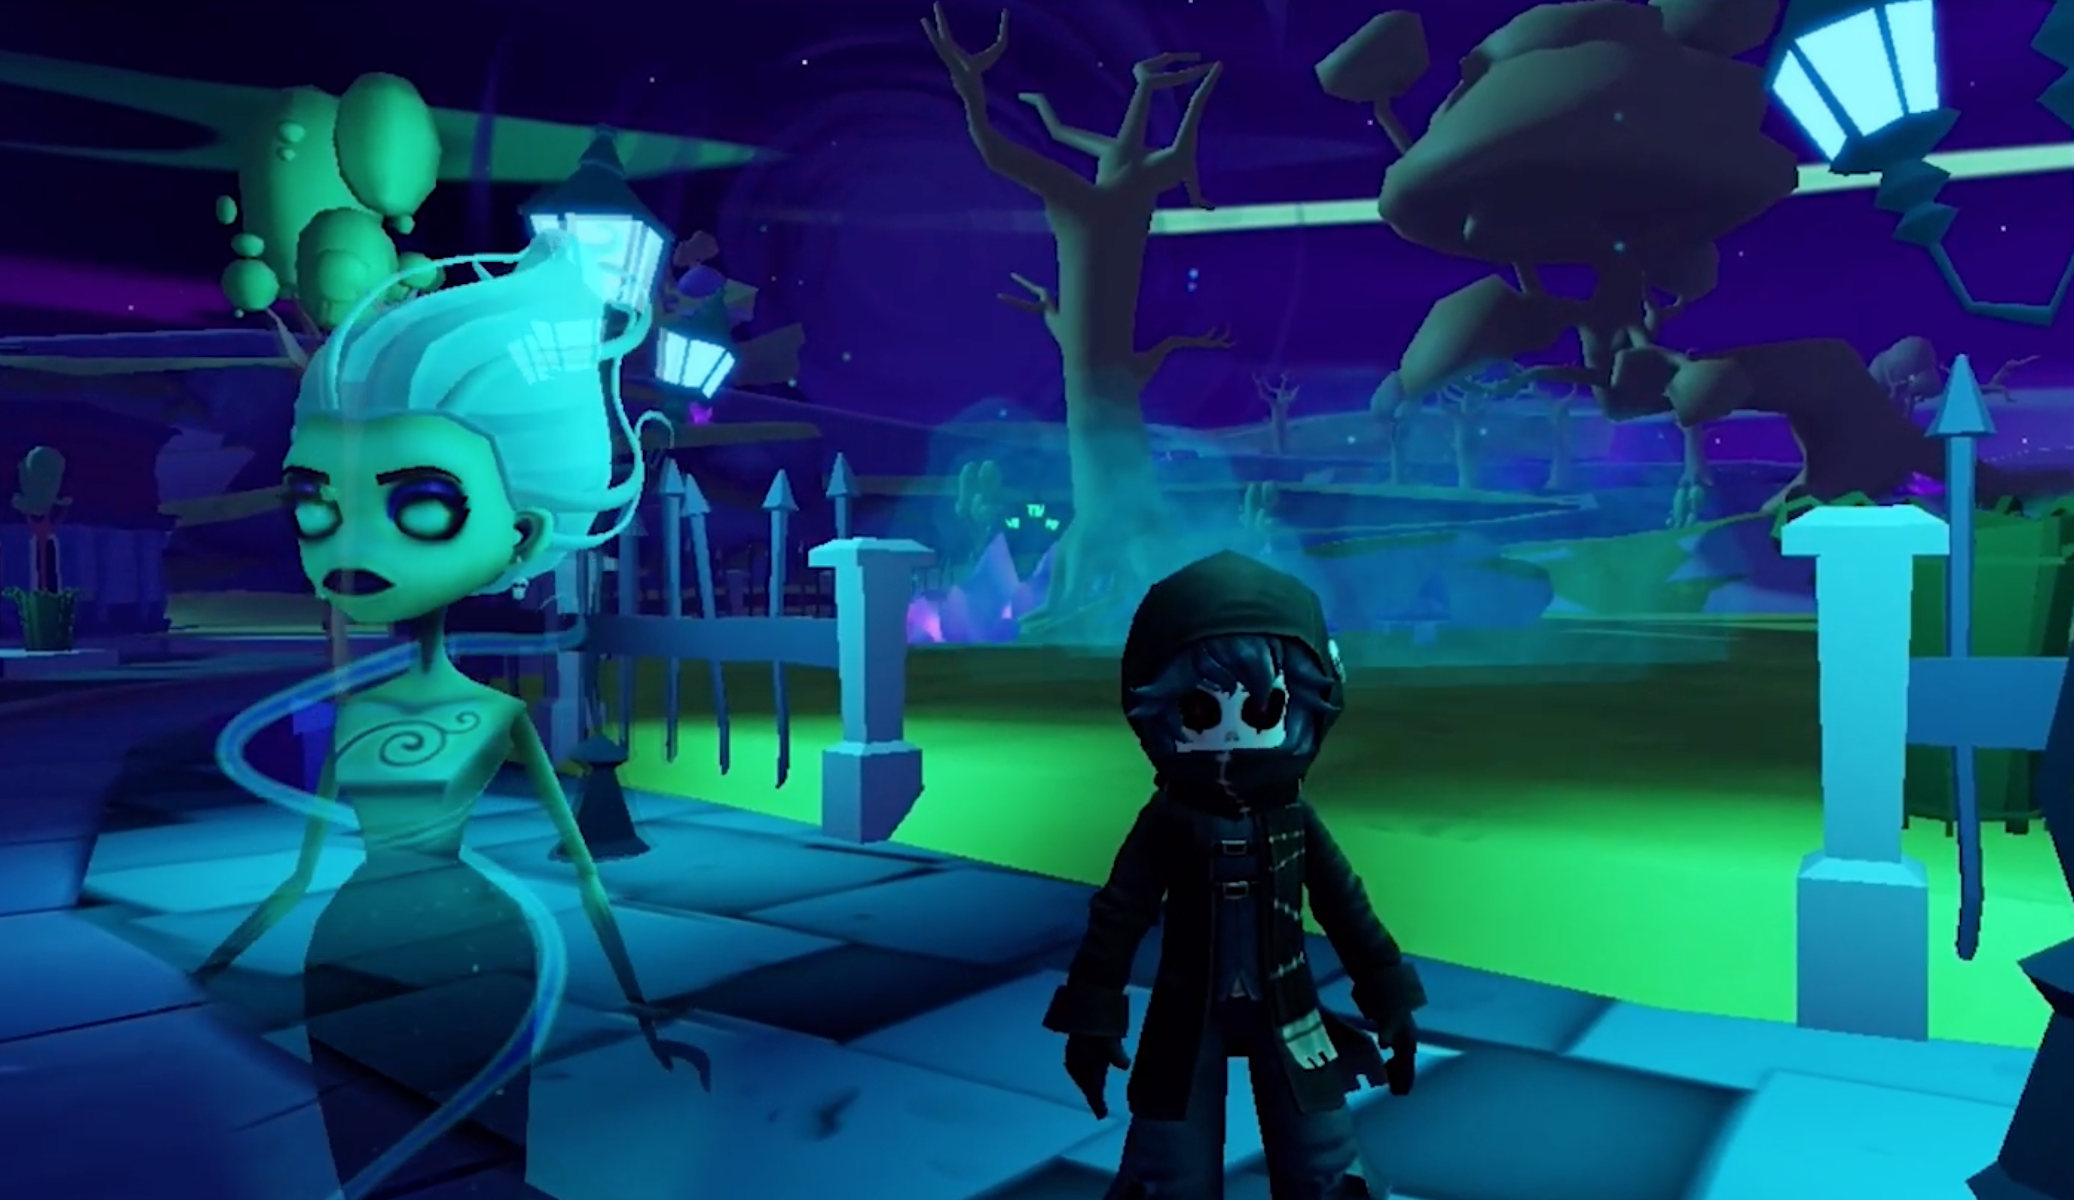 Game image Ghostopia